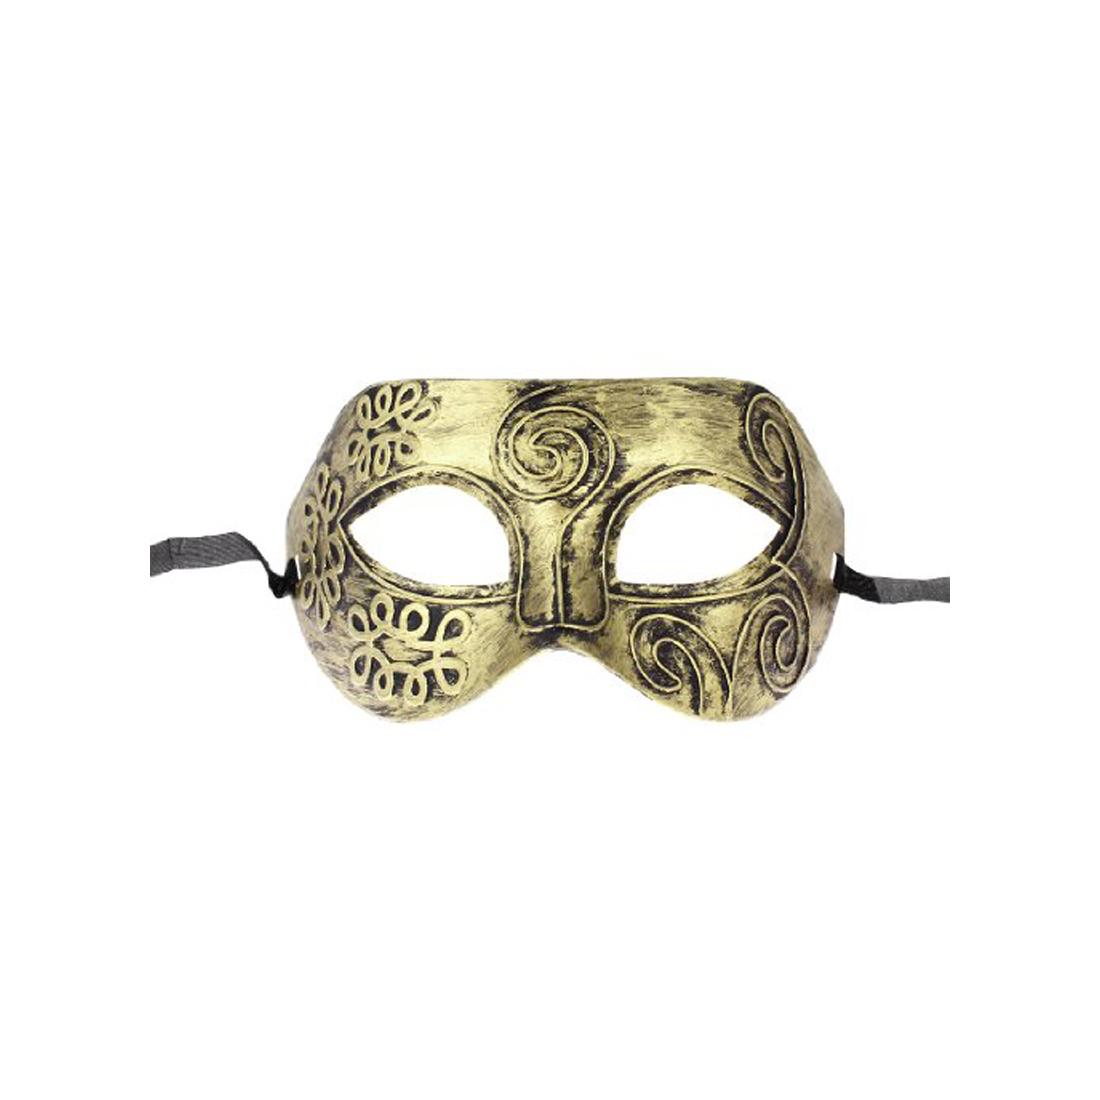 SZS Hot Gold Tone Roman Greek Mens Venetian Halloween Costume Party Masquerade Mask(China (Mainland))